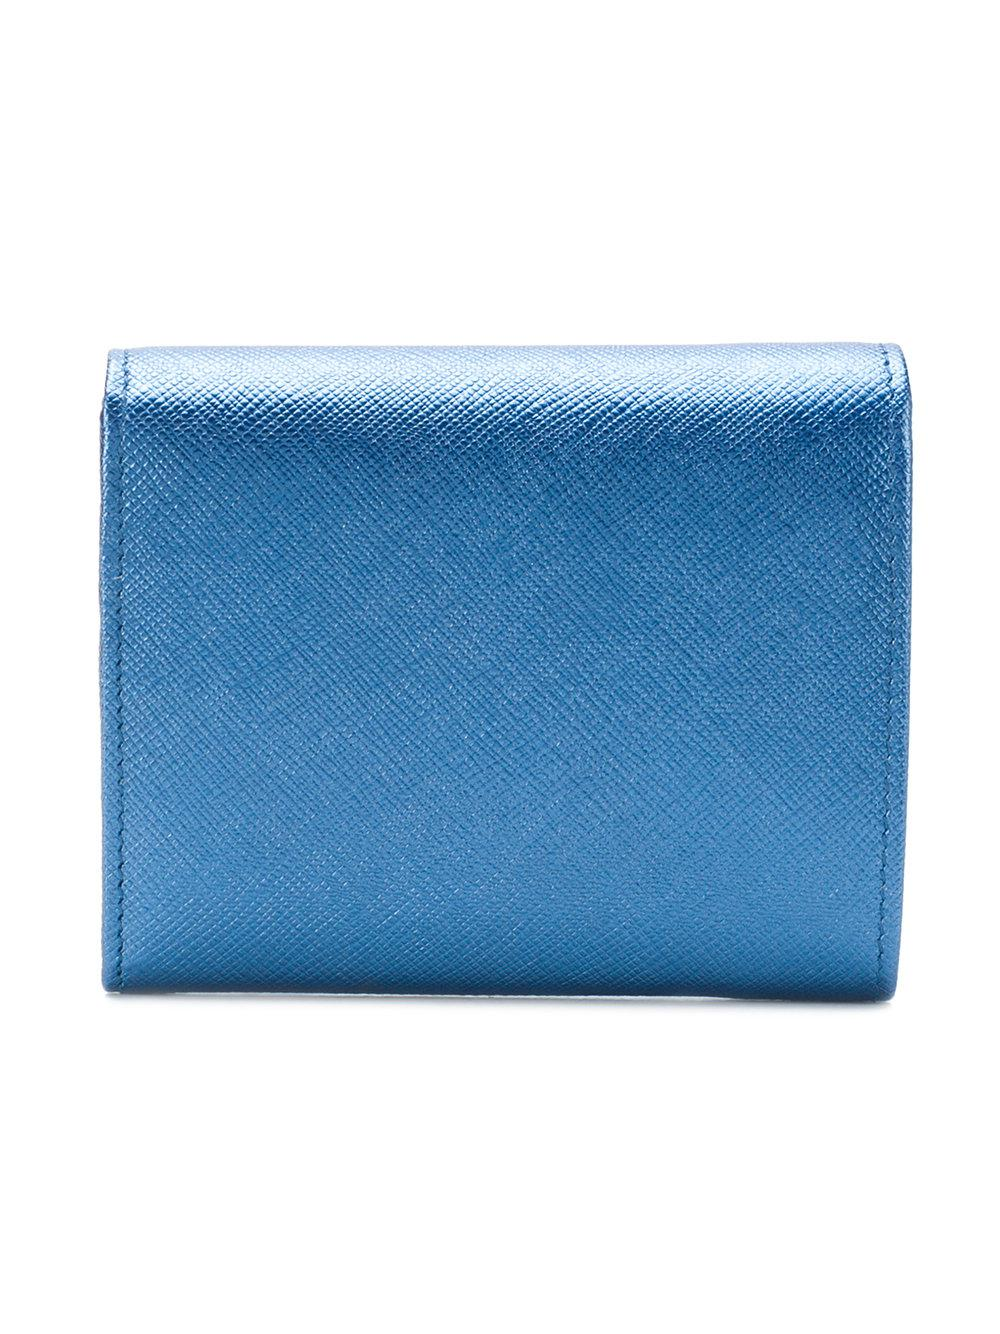 844934e39 Flap Cartera Logo En Mini Prada Lyst Azul Oq0BvfFw